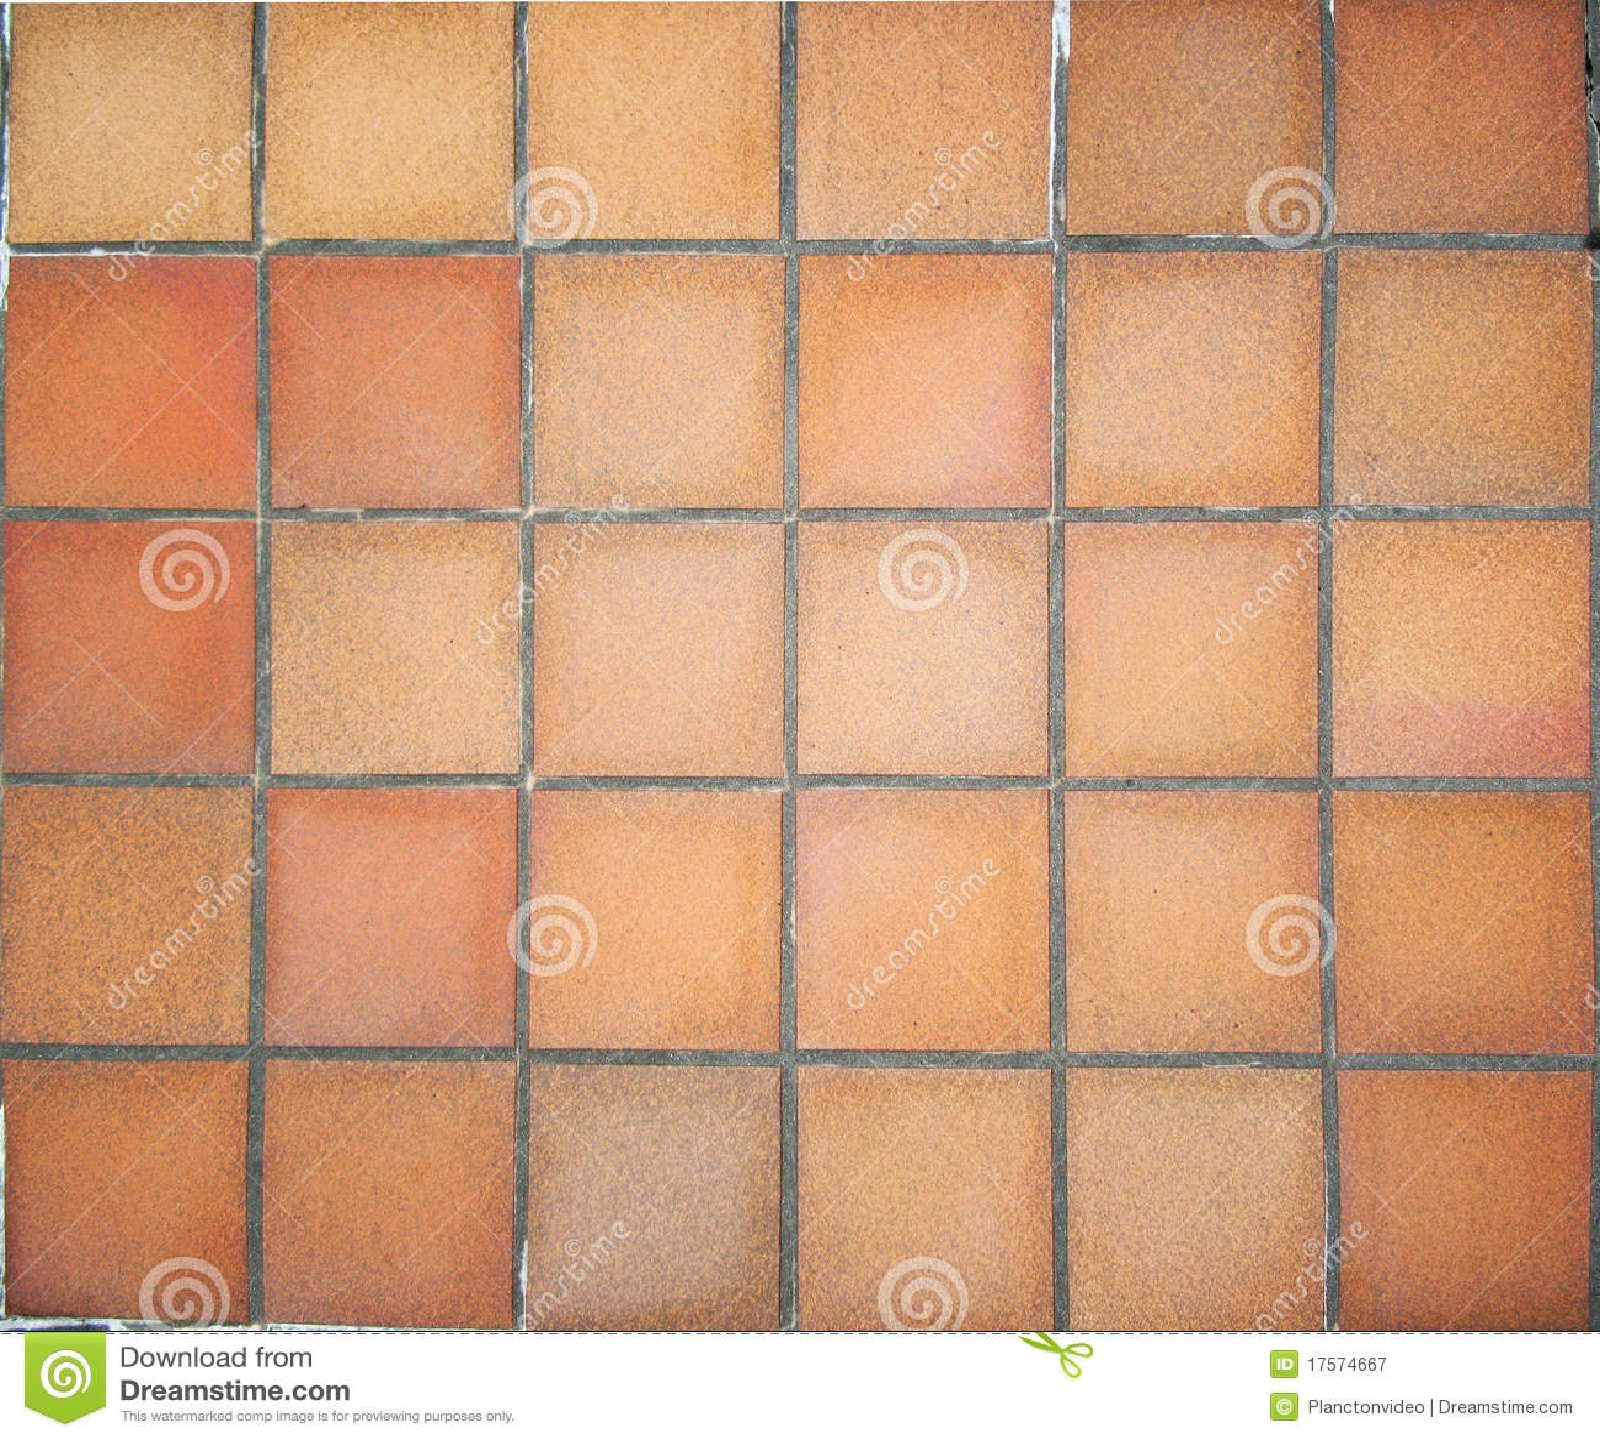 Terracotta Floor Tiles Royalty Free Stock Photography